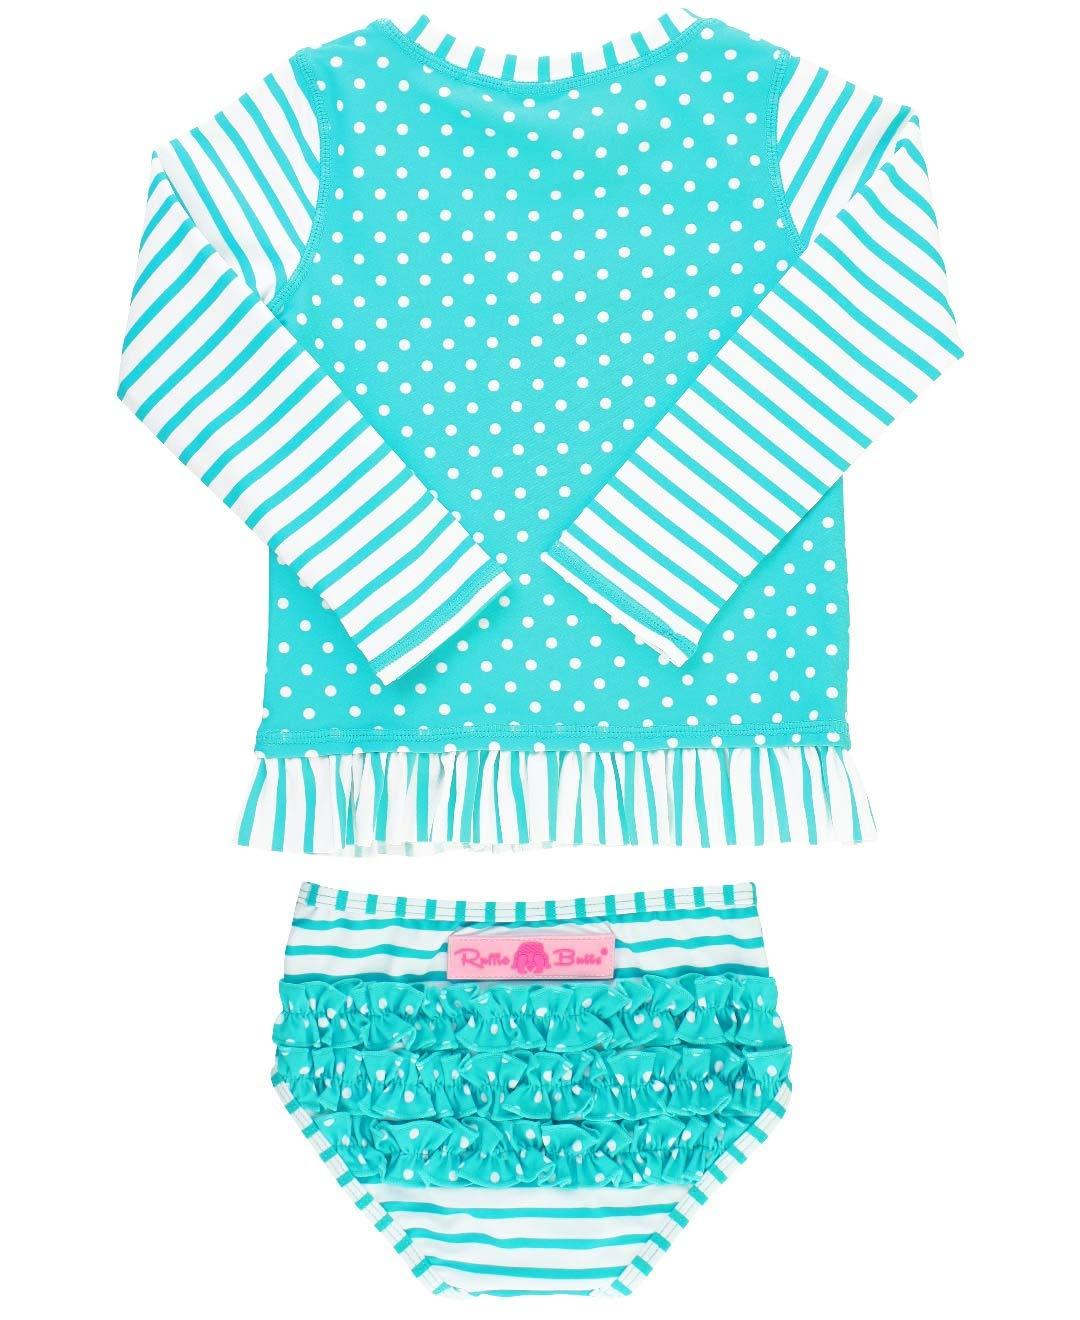 7b8c196983 RuffleButts Baby/Toddler Girls Long Sleeve Rash Guard 2-Piece Swimsuit Set  - Stripes